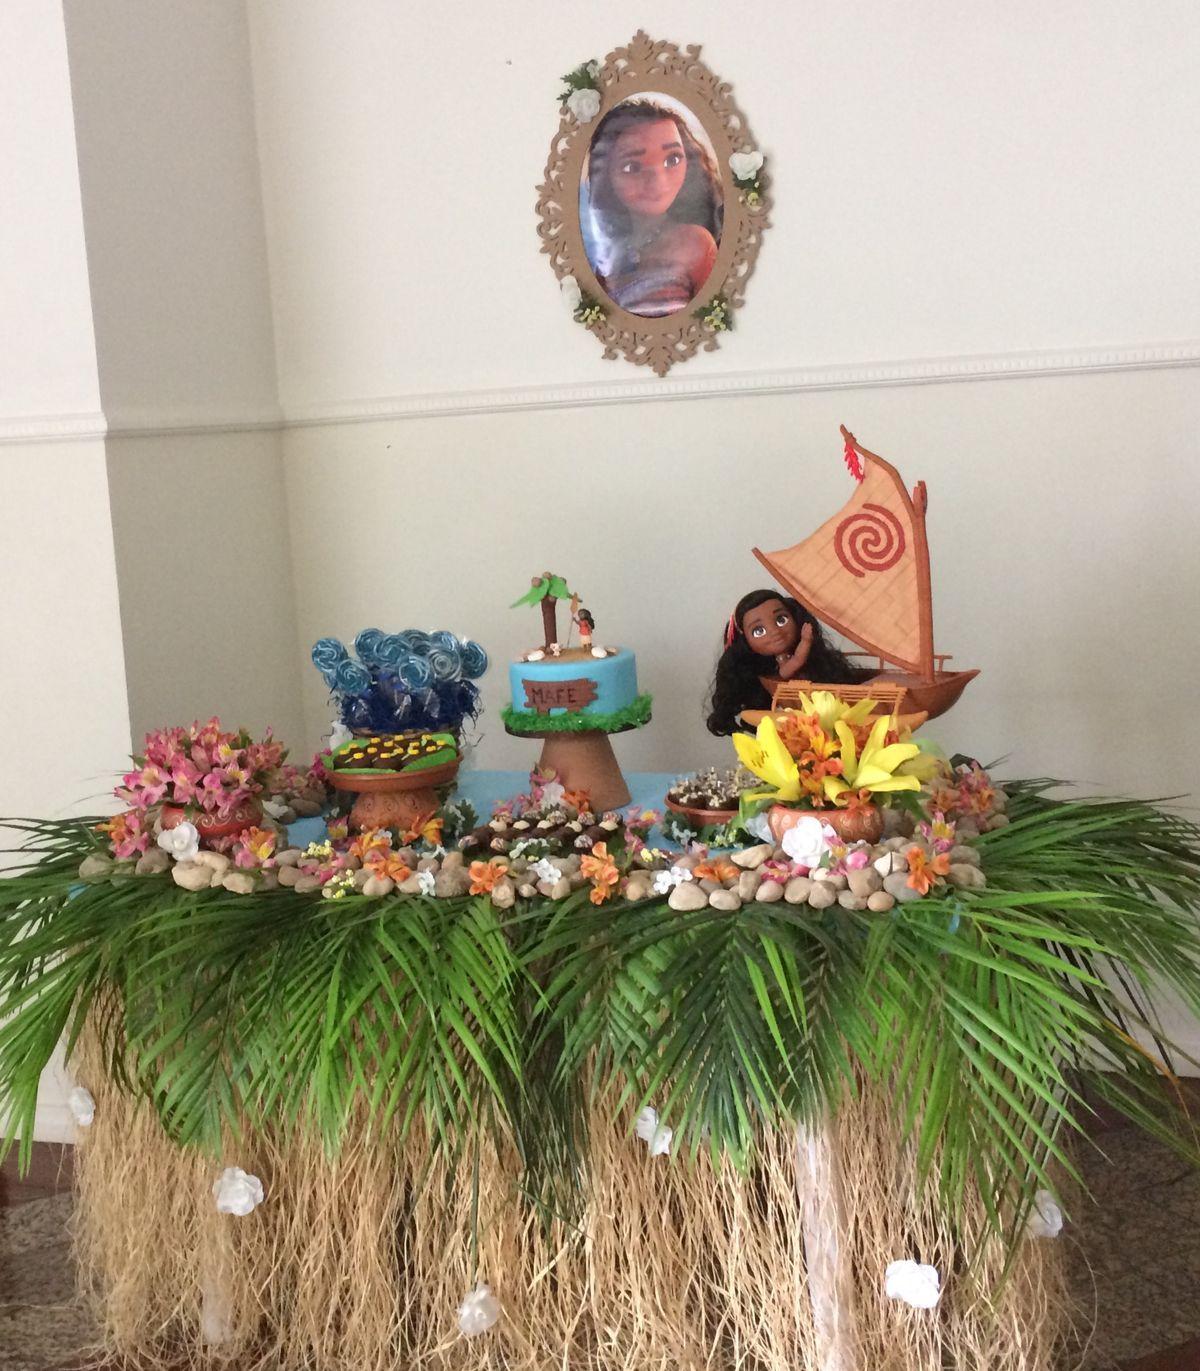 B3d6be122f9ca581e88a3c0a0dfea9b8 Jpg 1 200 1 371 Pixels Moana Themed Party Hawaiian Party Decorations Luau Birthday Party